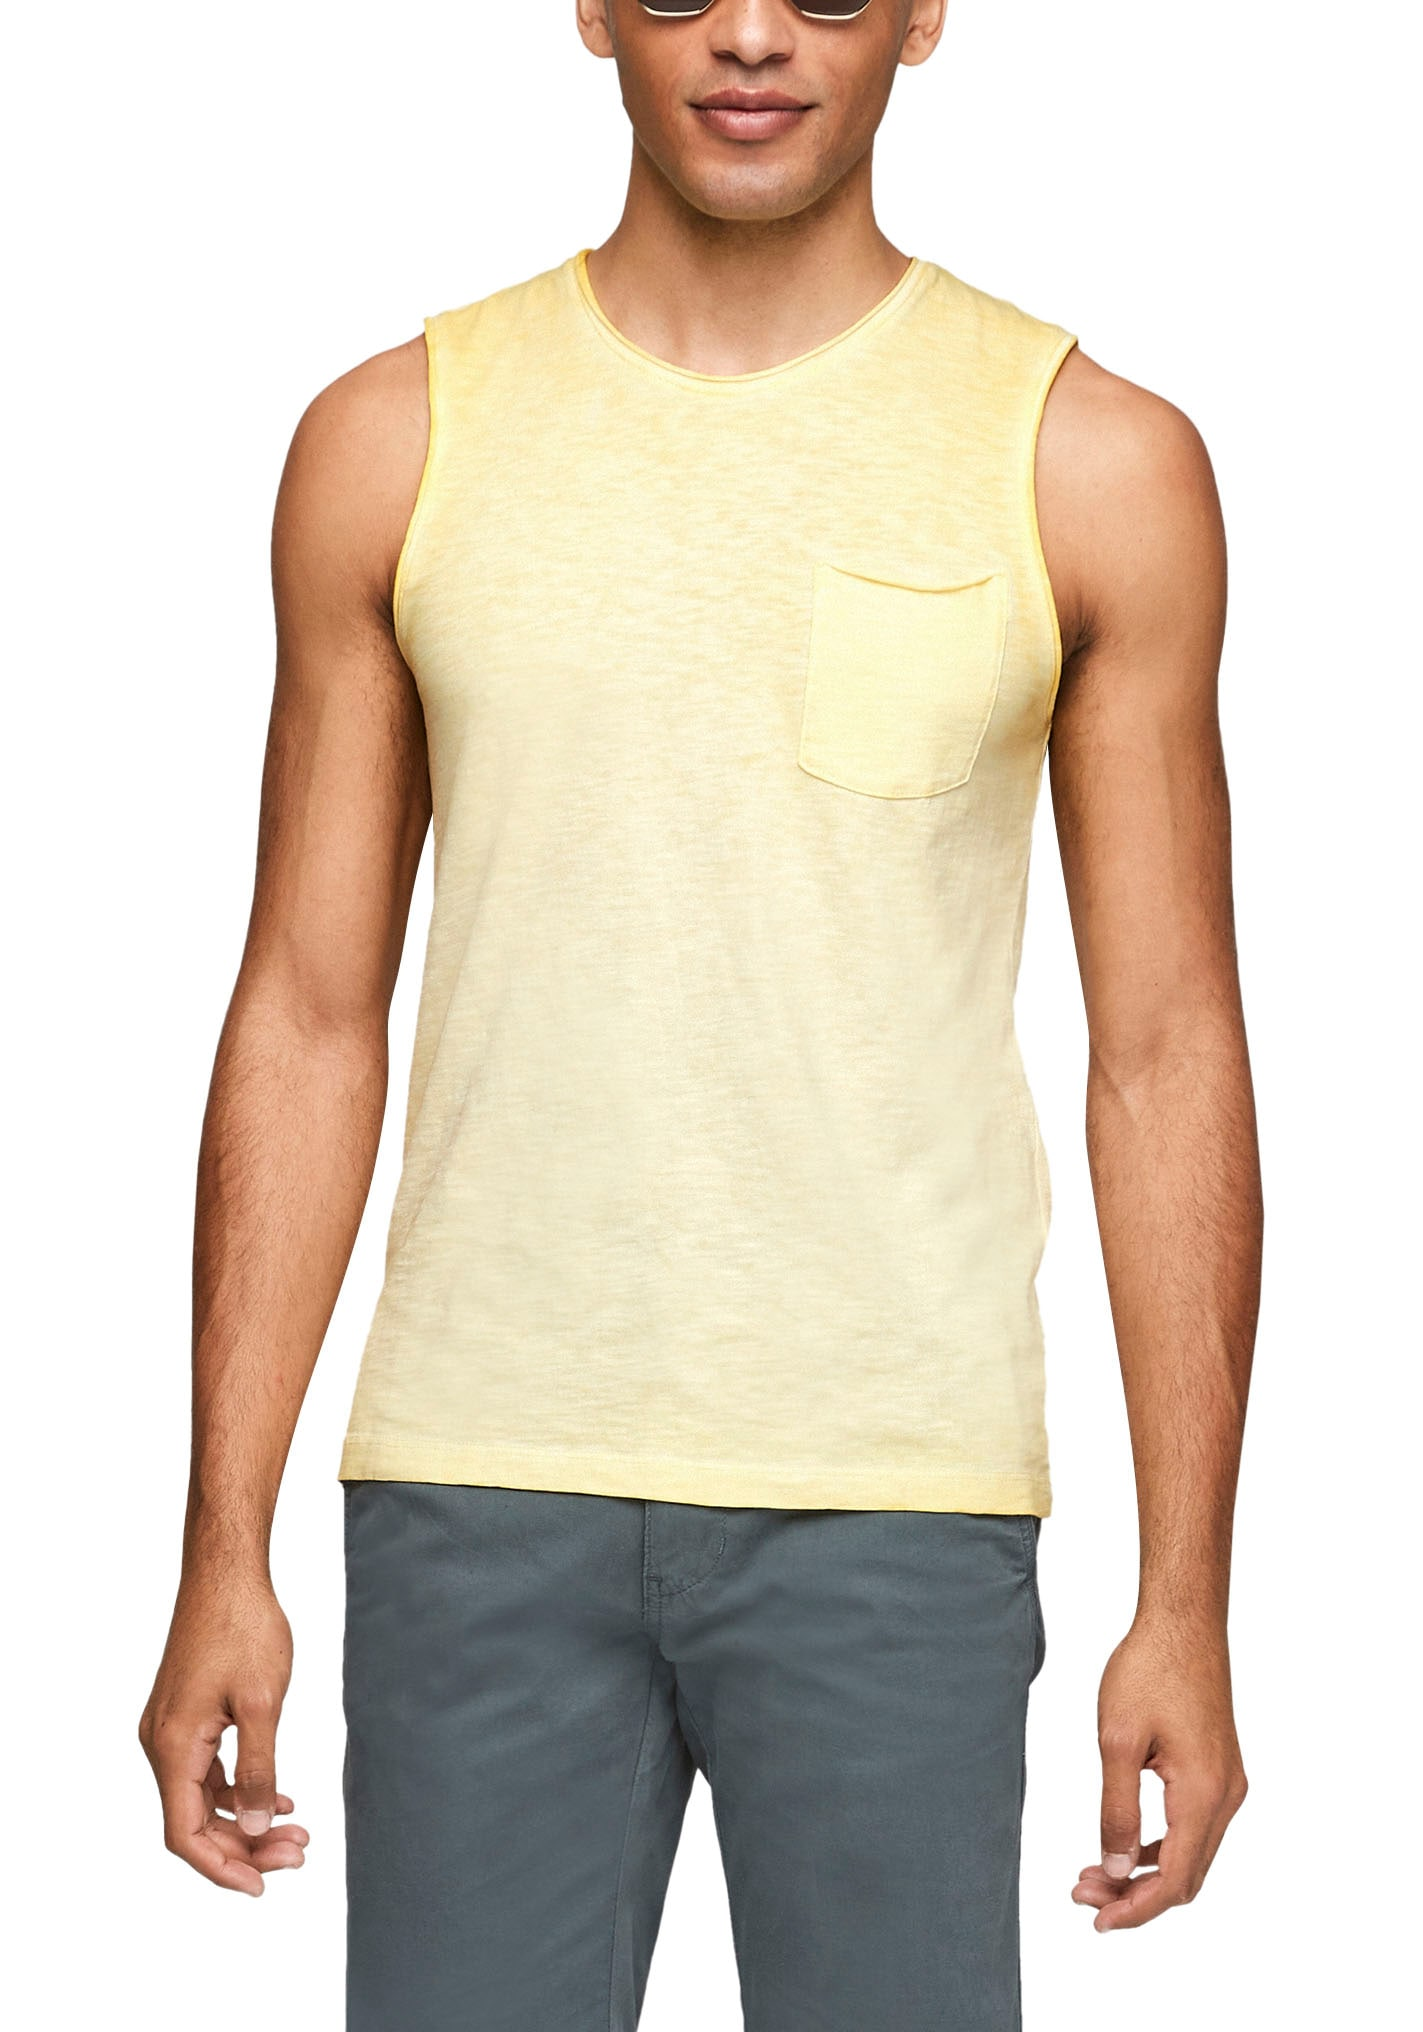 s.Oliver Muskelshirt, ohne Ärmel gelb Herren Muskelshirts Shirts Muskelshirt